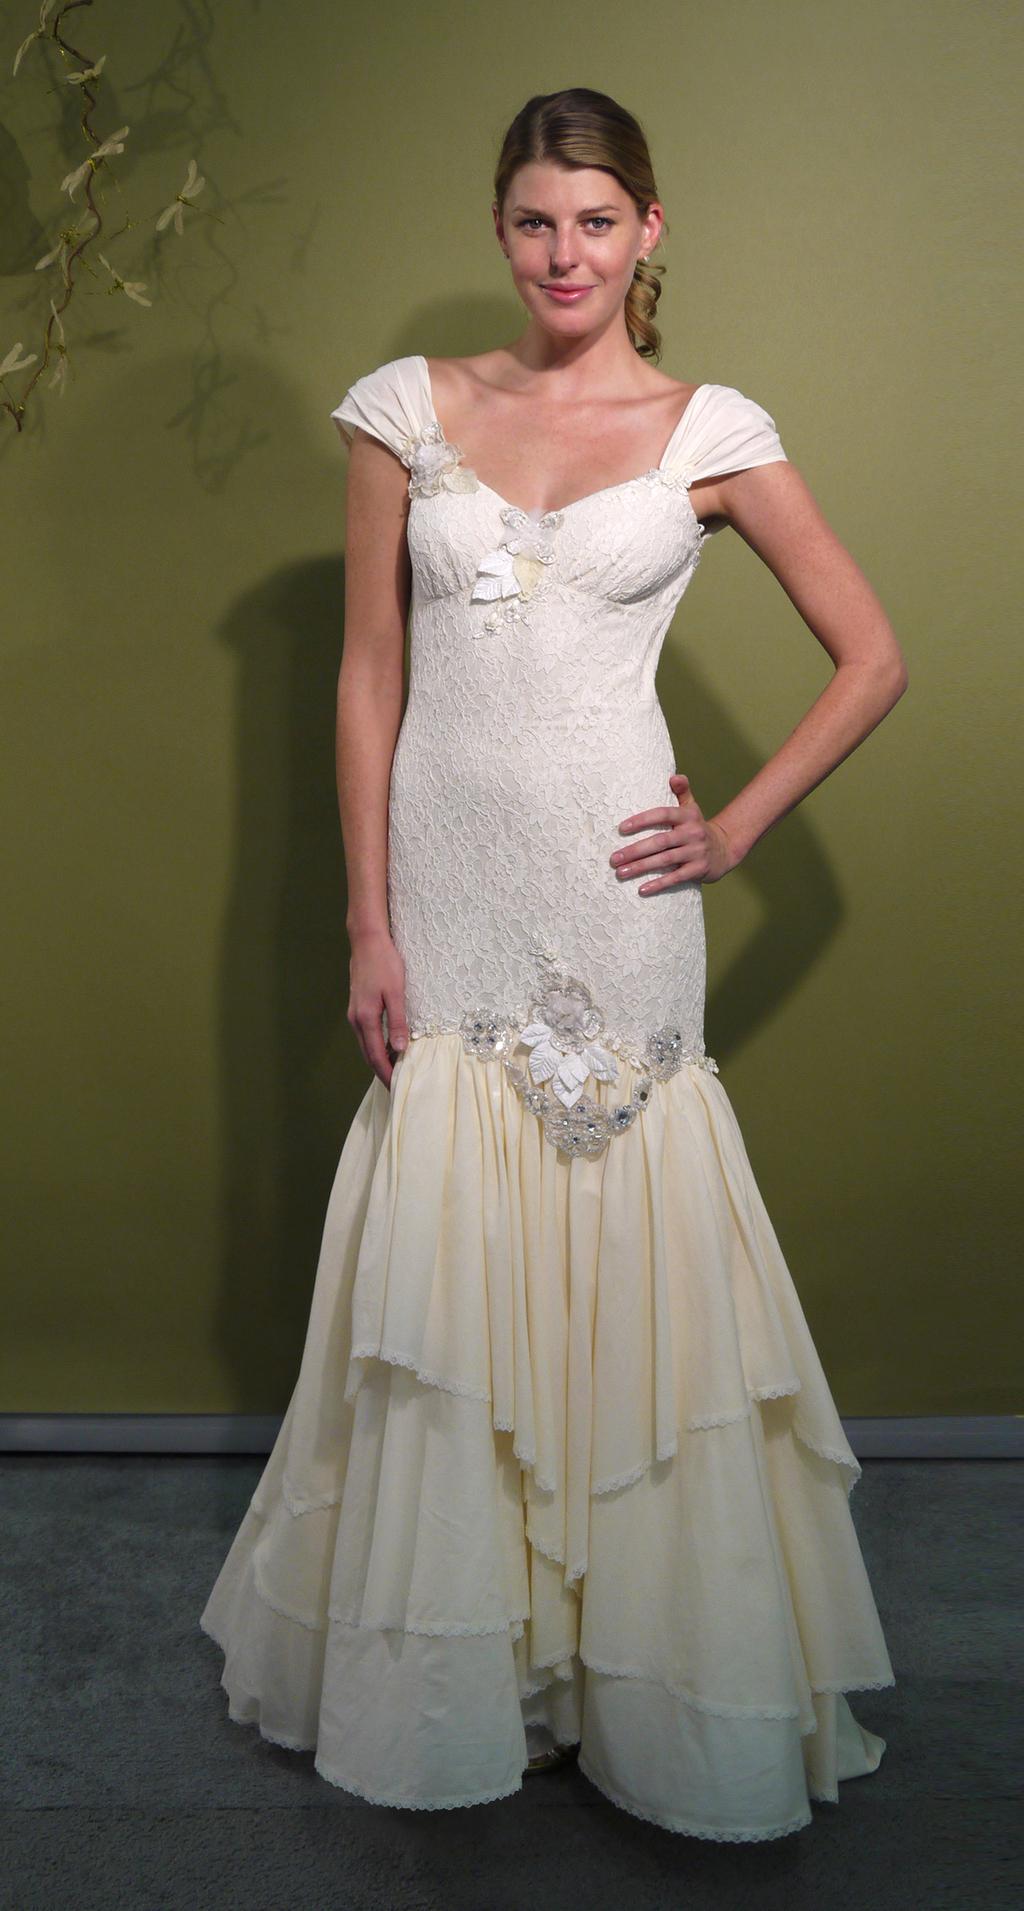 Fall-2011-wedding-dress-emmaline-bridal-gown-claire-pettibone-cap-sleeves-large.full